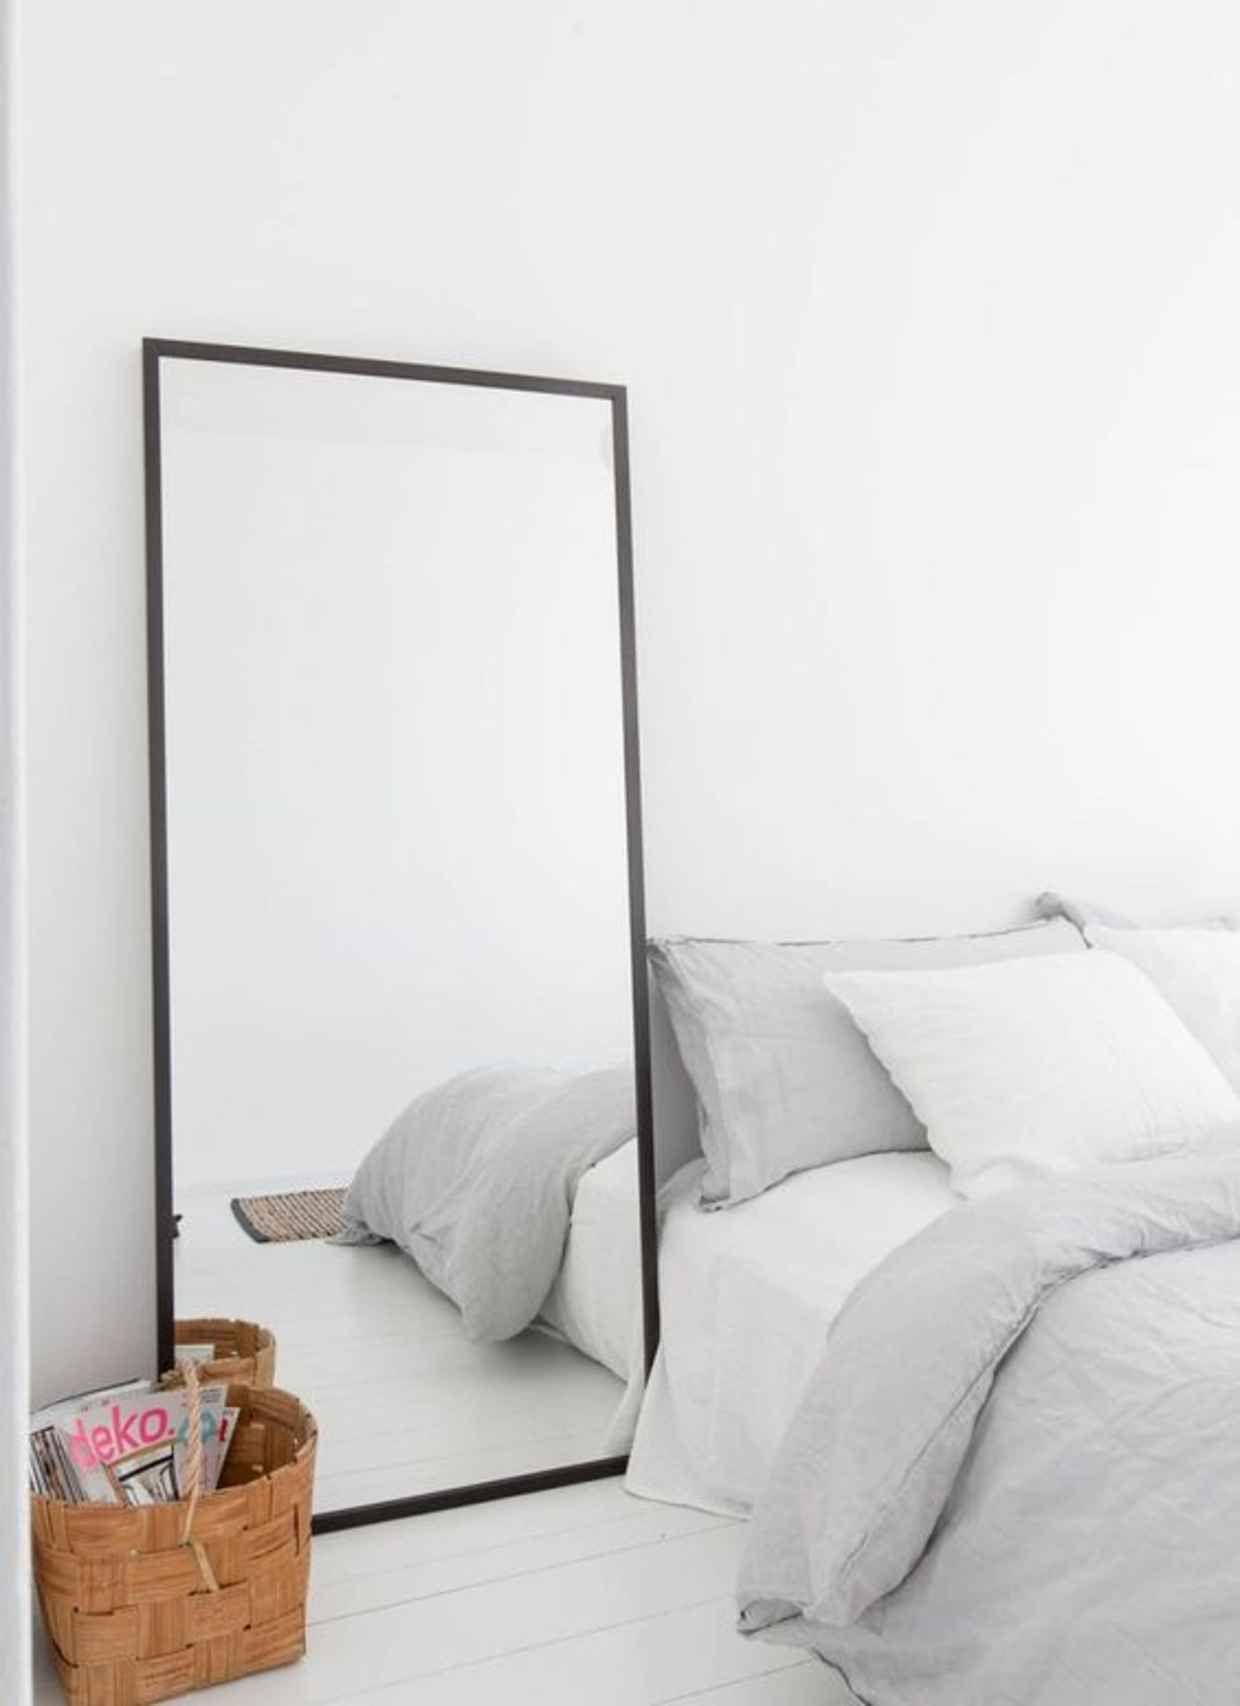 22 Examples Of Minimal Interior Design #35 #minimalinteriors